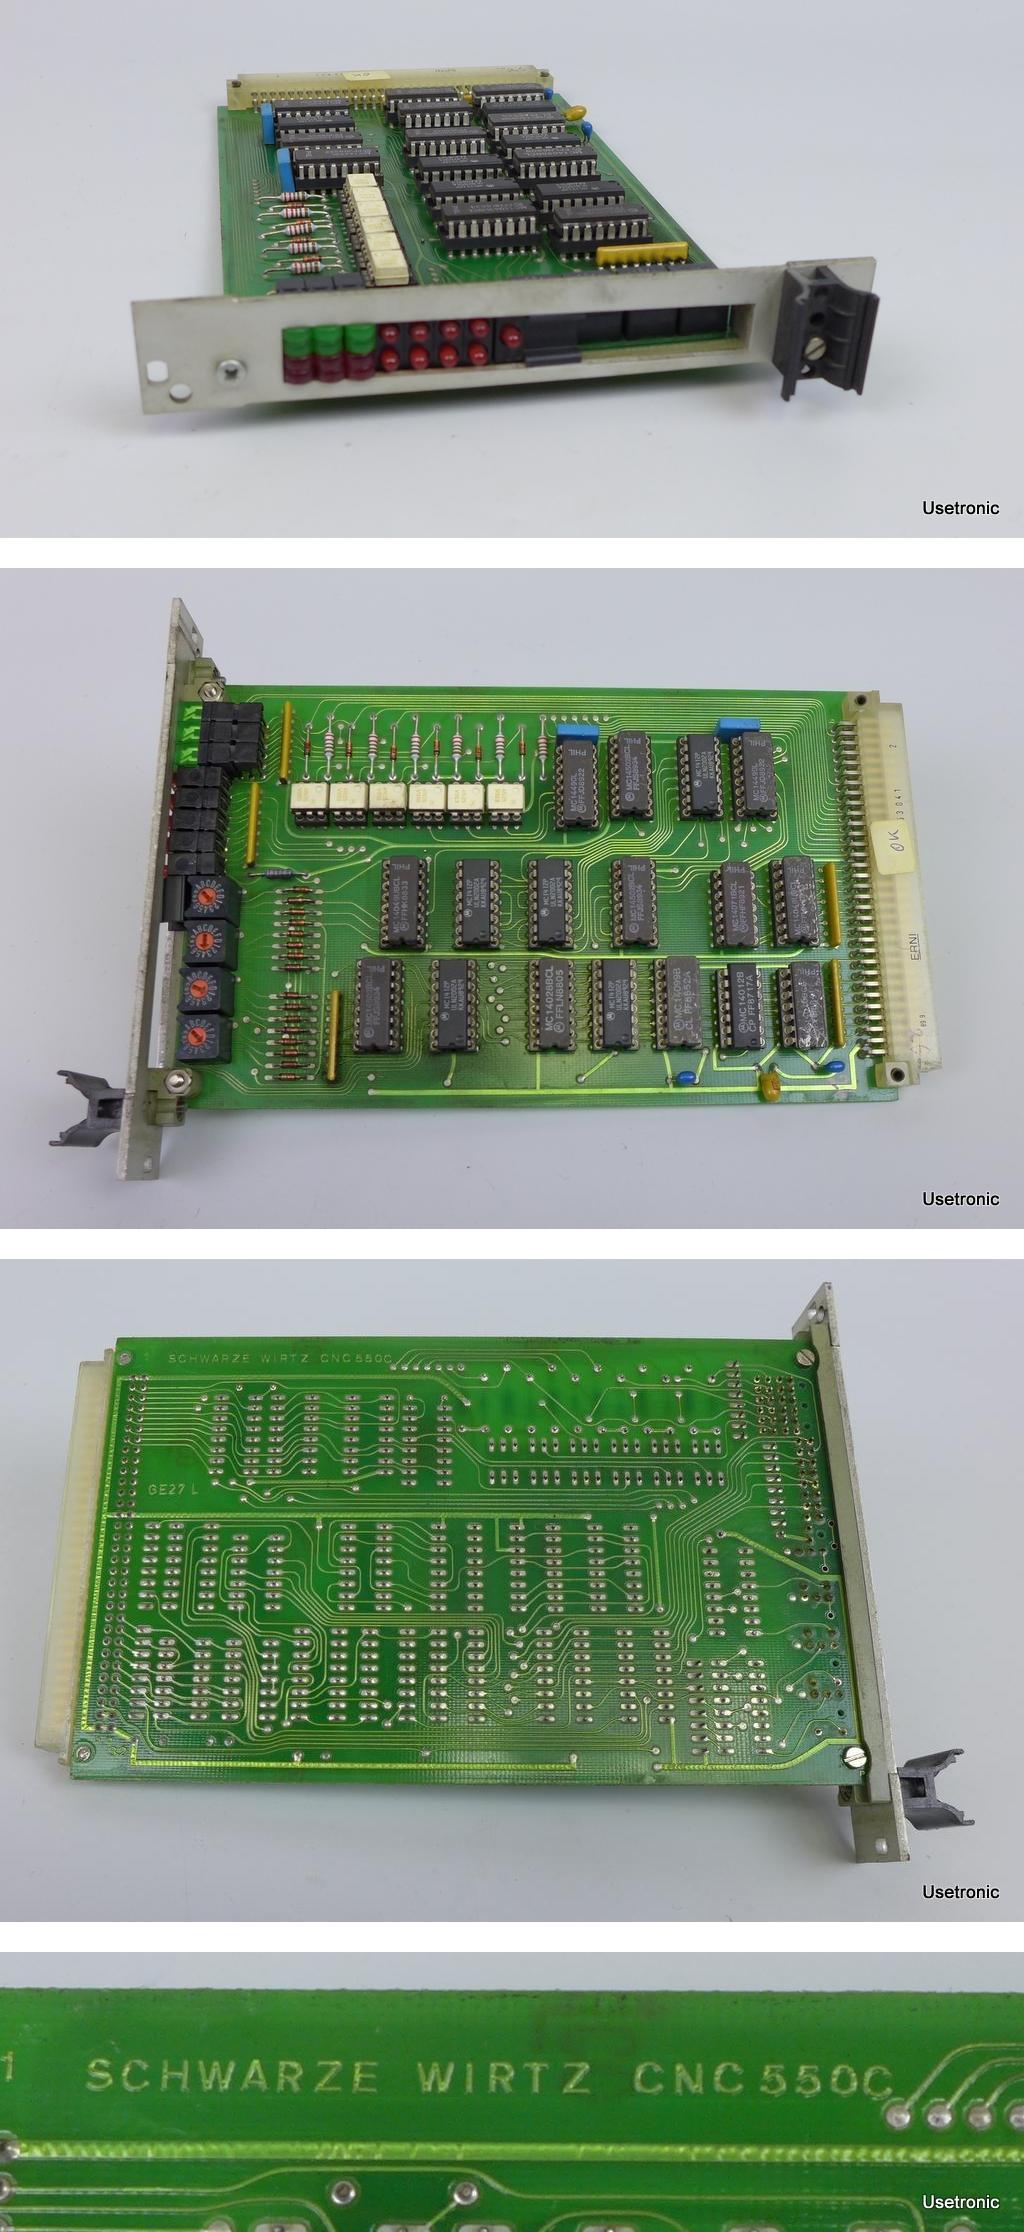 Schwarze Wirtz CNC 550C